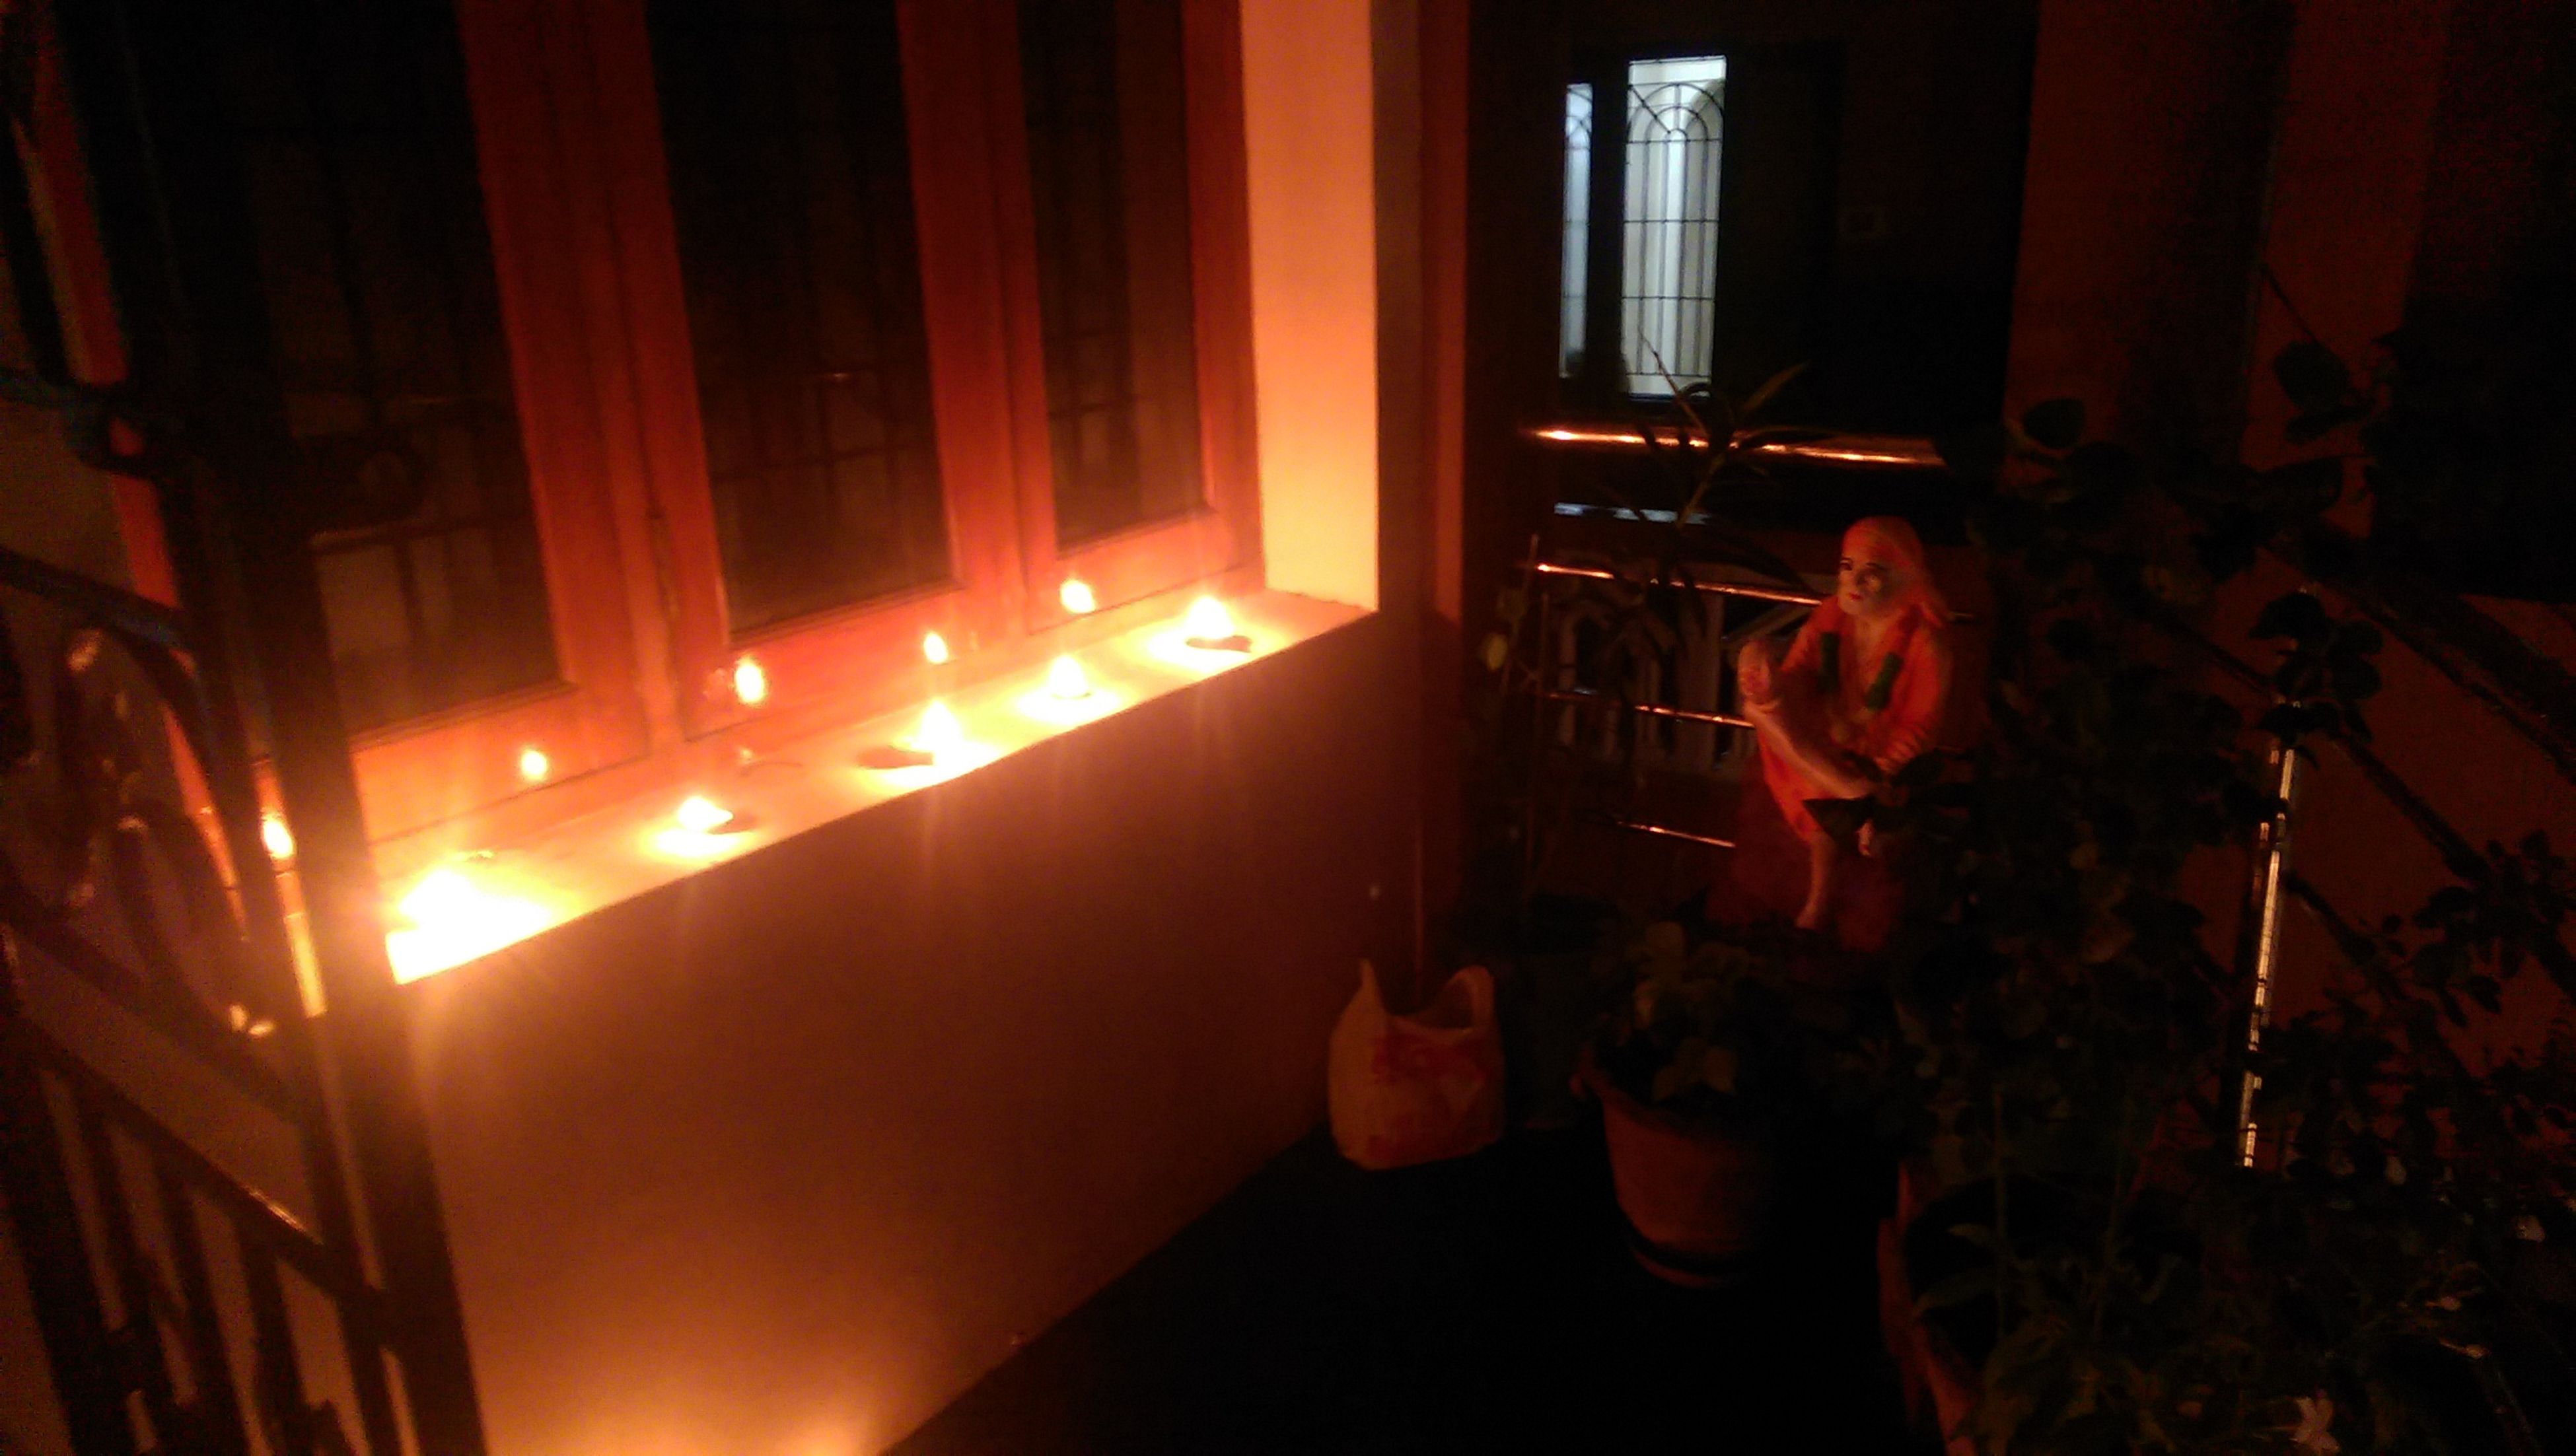 Happy Diwali! Diwali2014 Lowlight Lamps